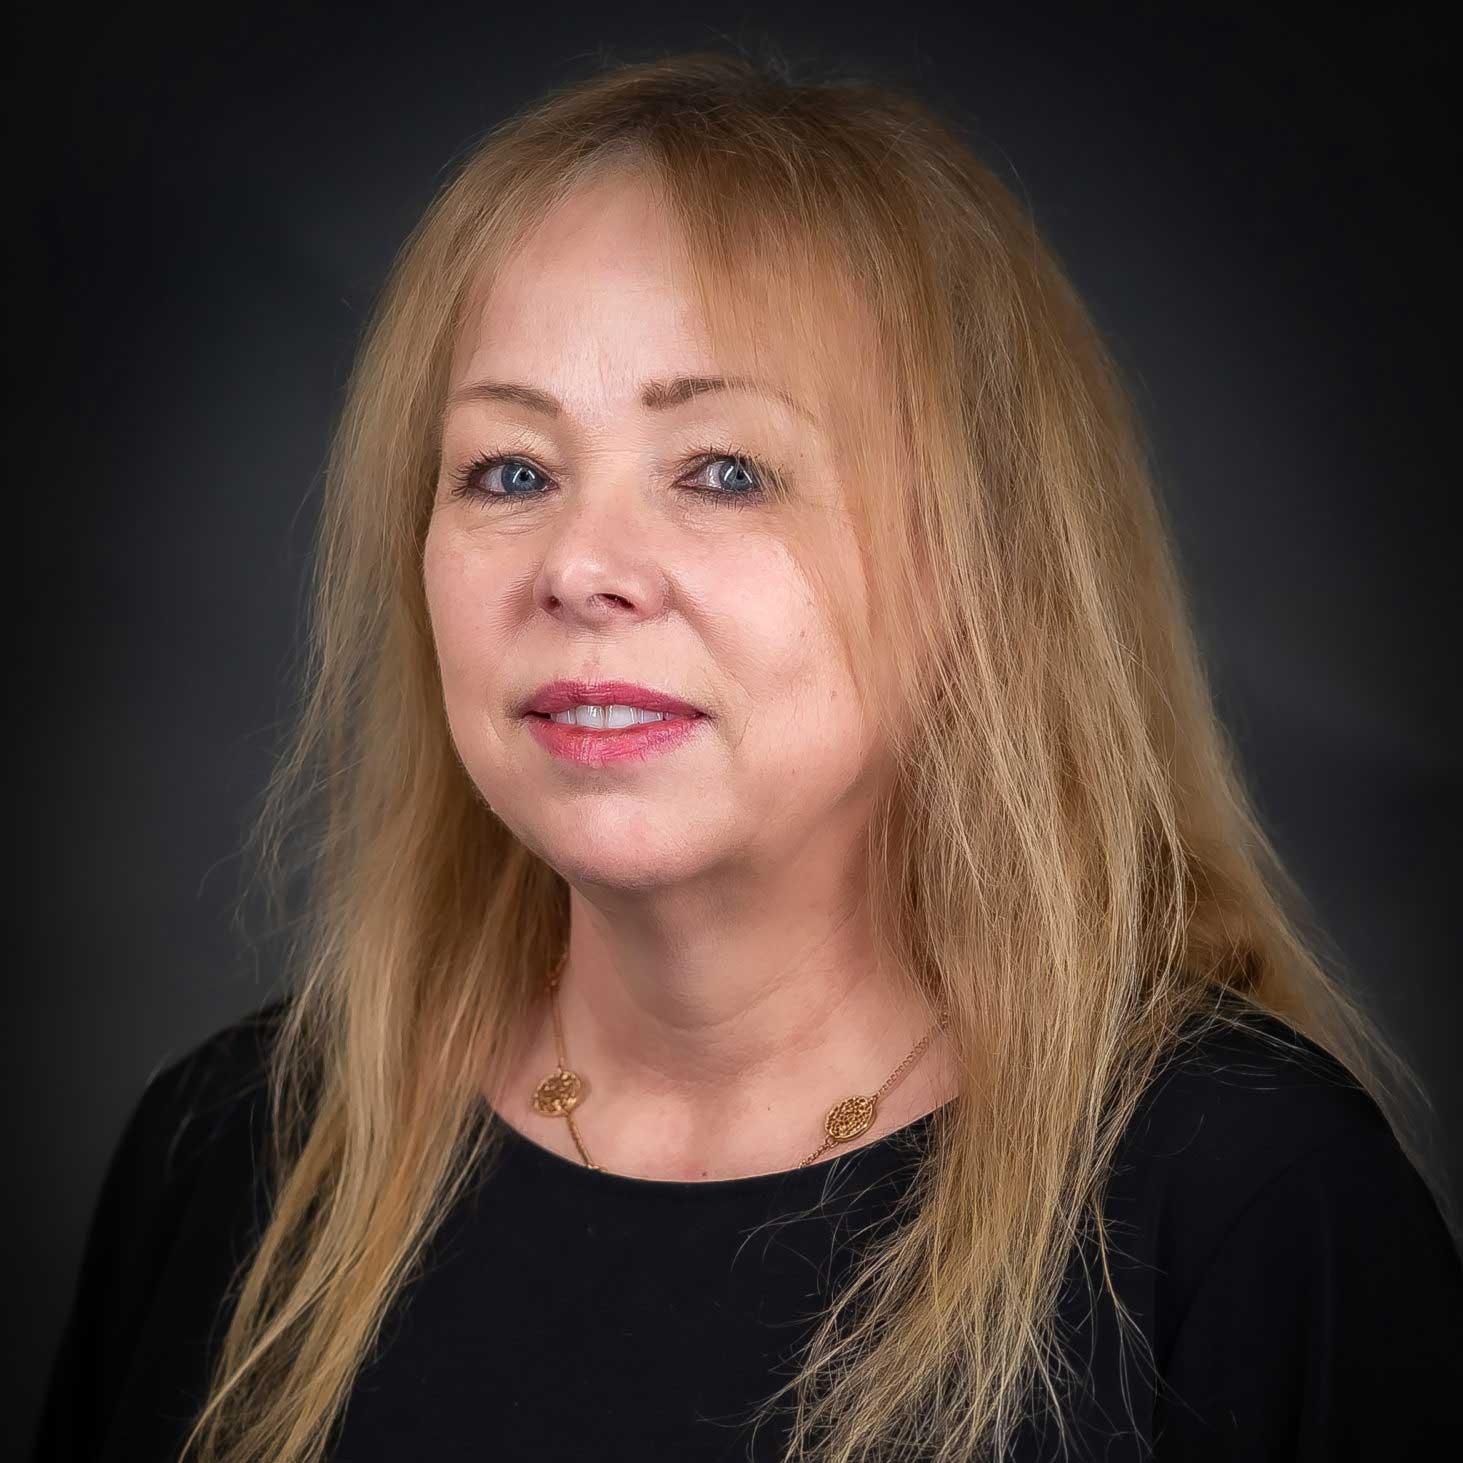 Valerie Jolley